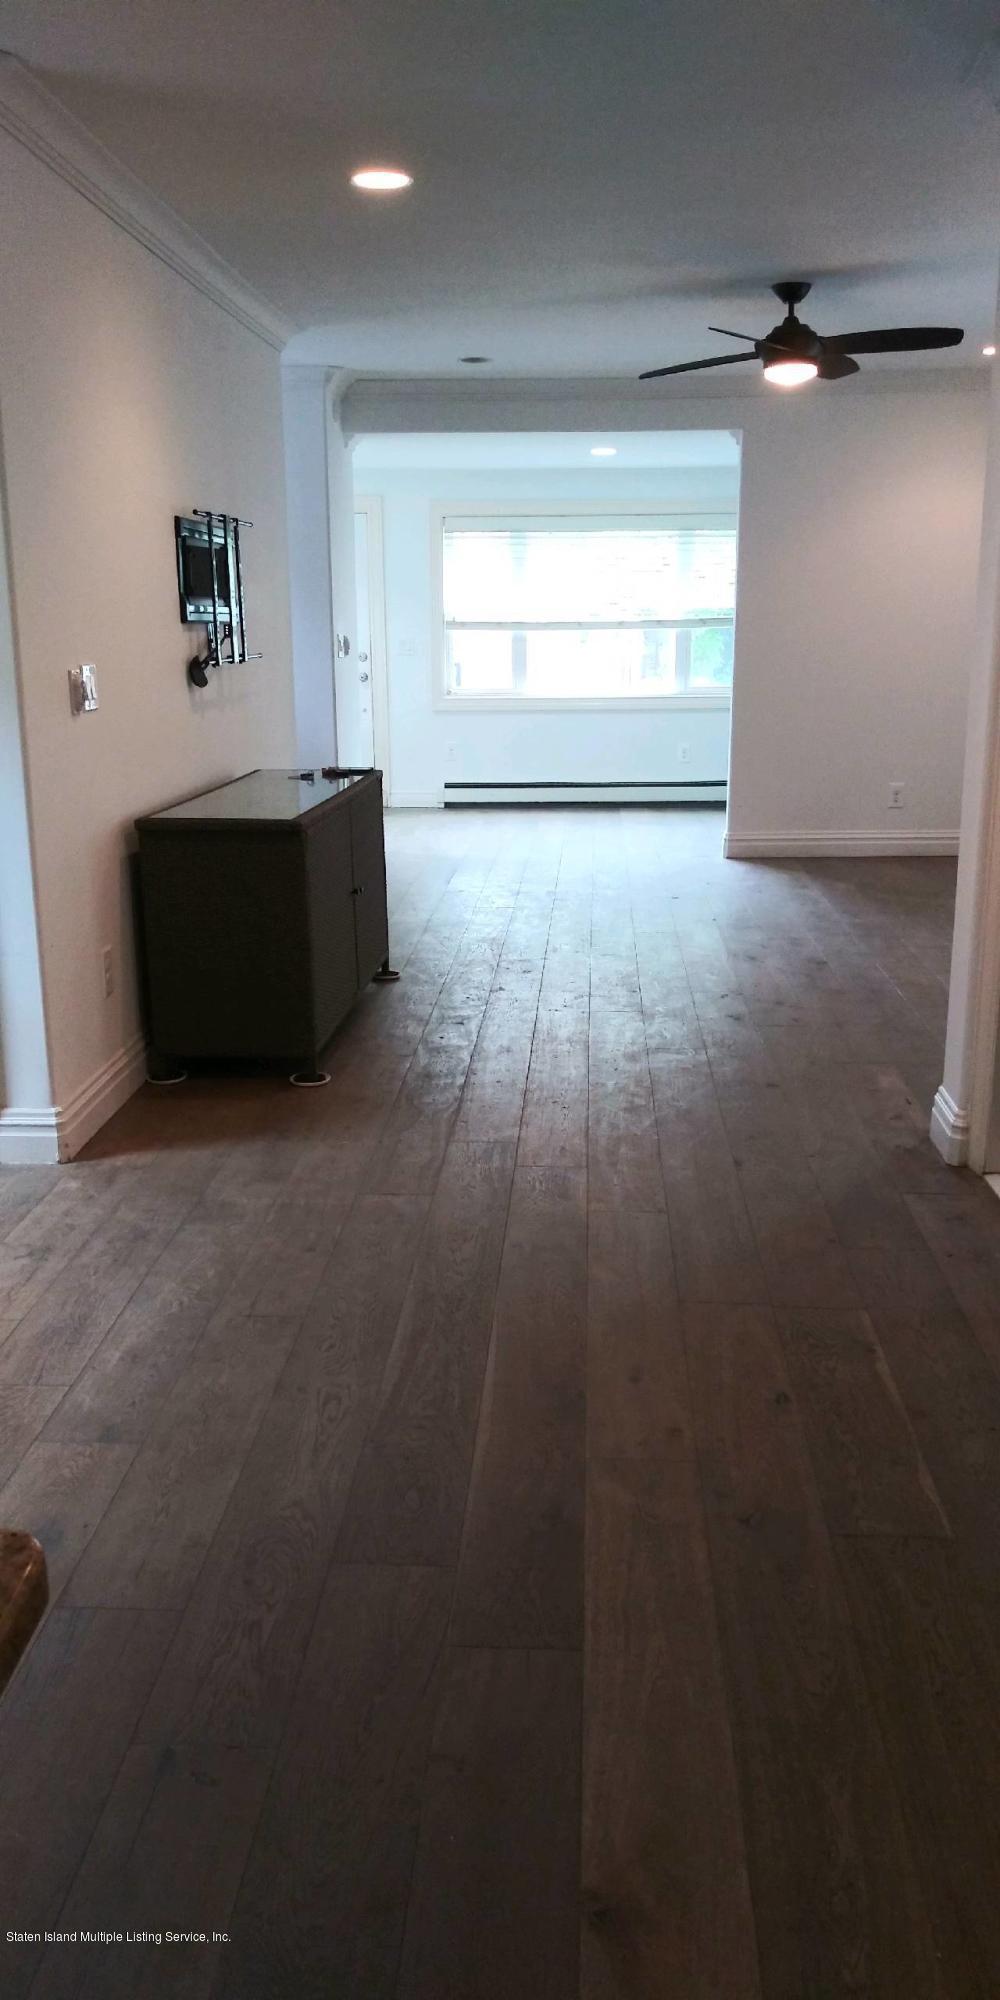 228 Wiman Avenue,Staten Island,New York,10308,United States,3 Bedrooms Bedrooms,6 Rooms Rooms,3 BathroomsBathrooms,Res-Rental,Wiman,1129442